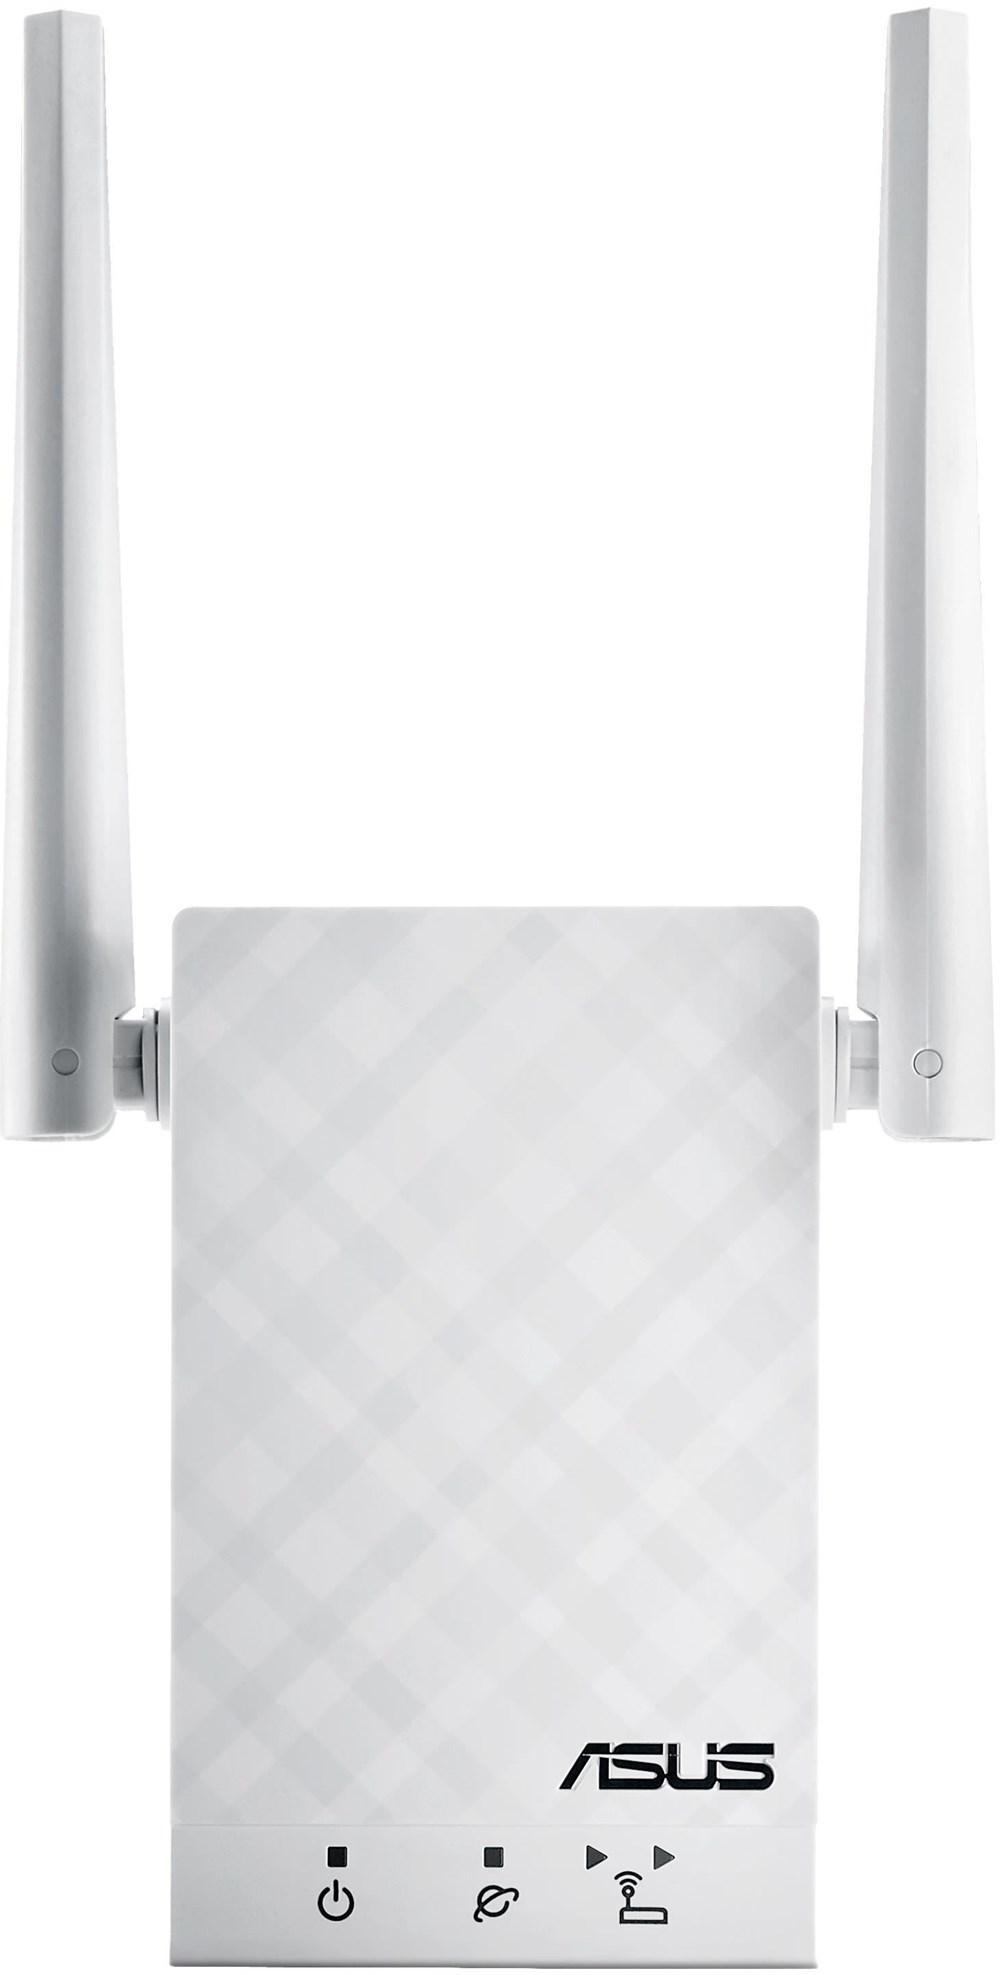 Repetidor Asus RP-AC55 Wireless AC1200